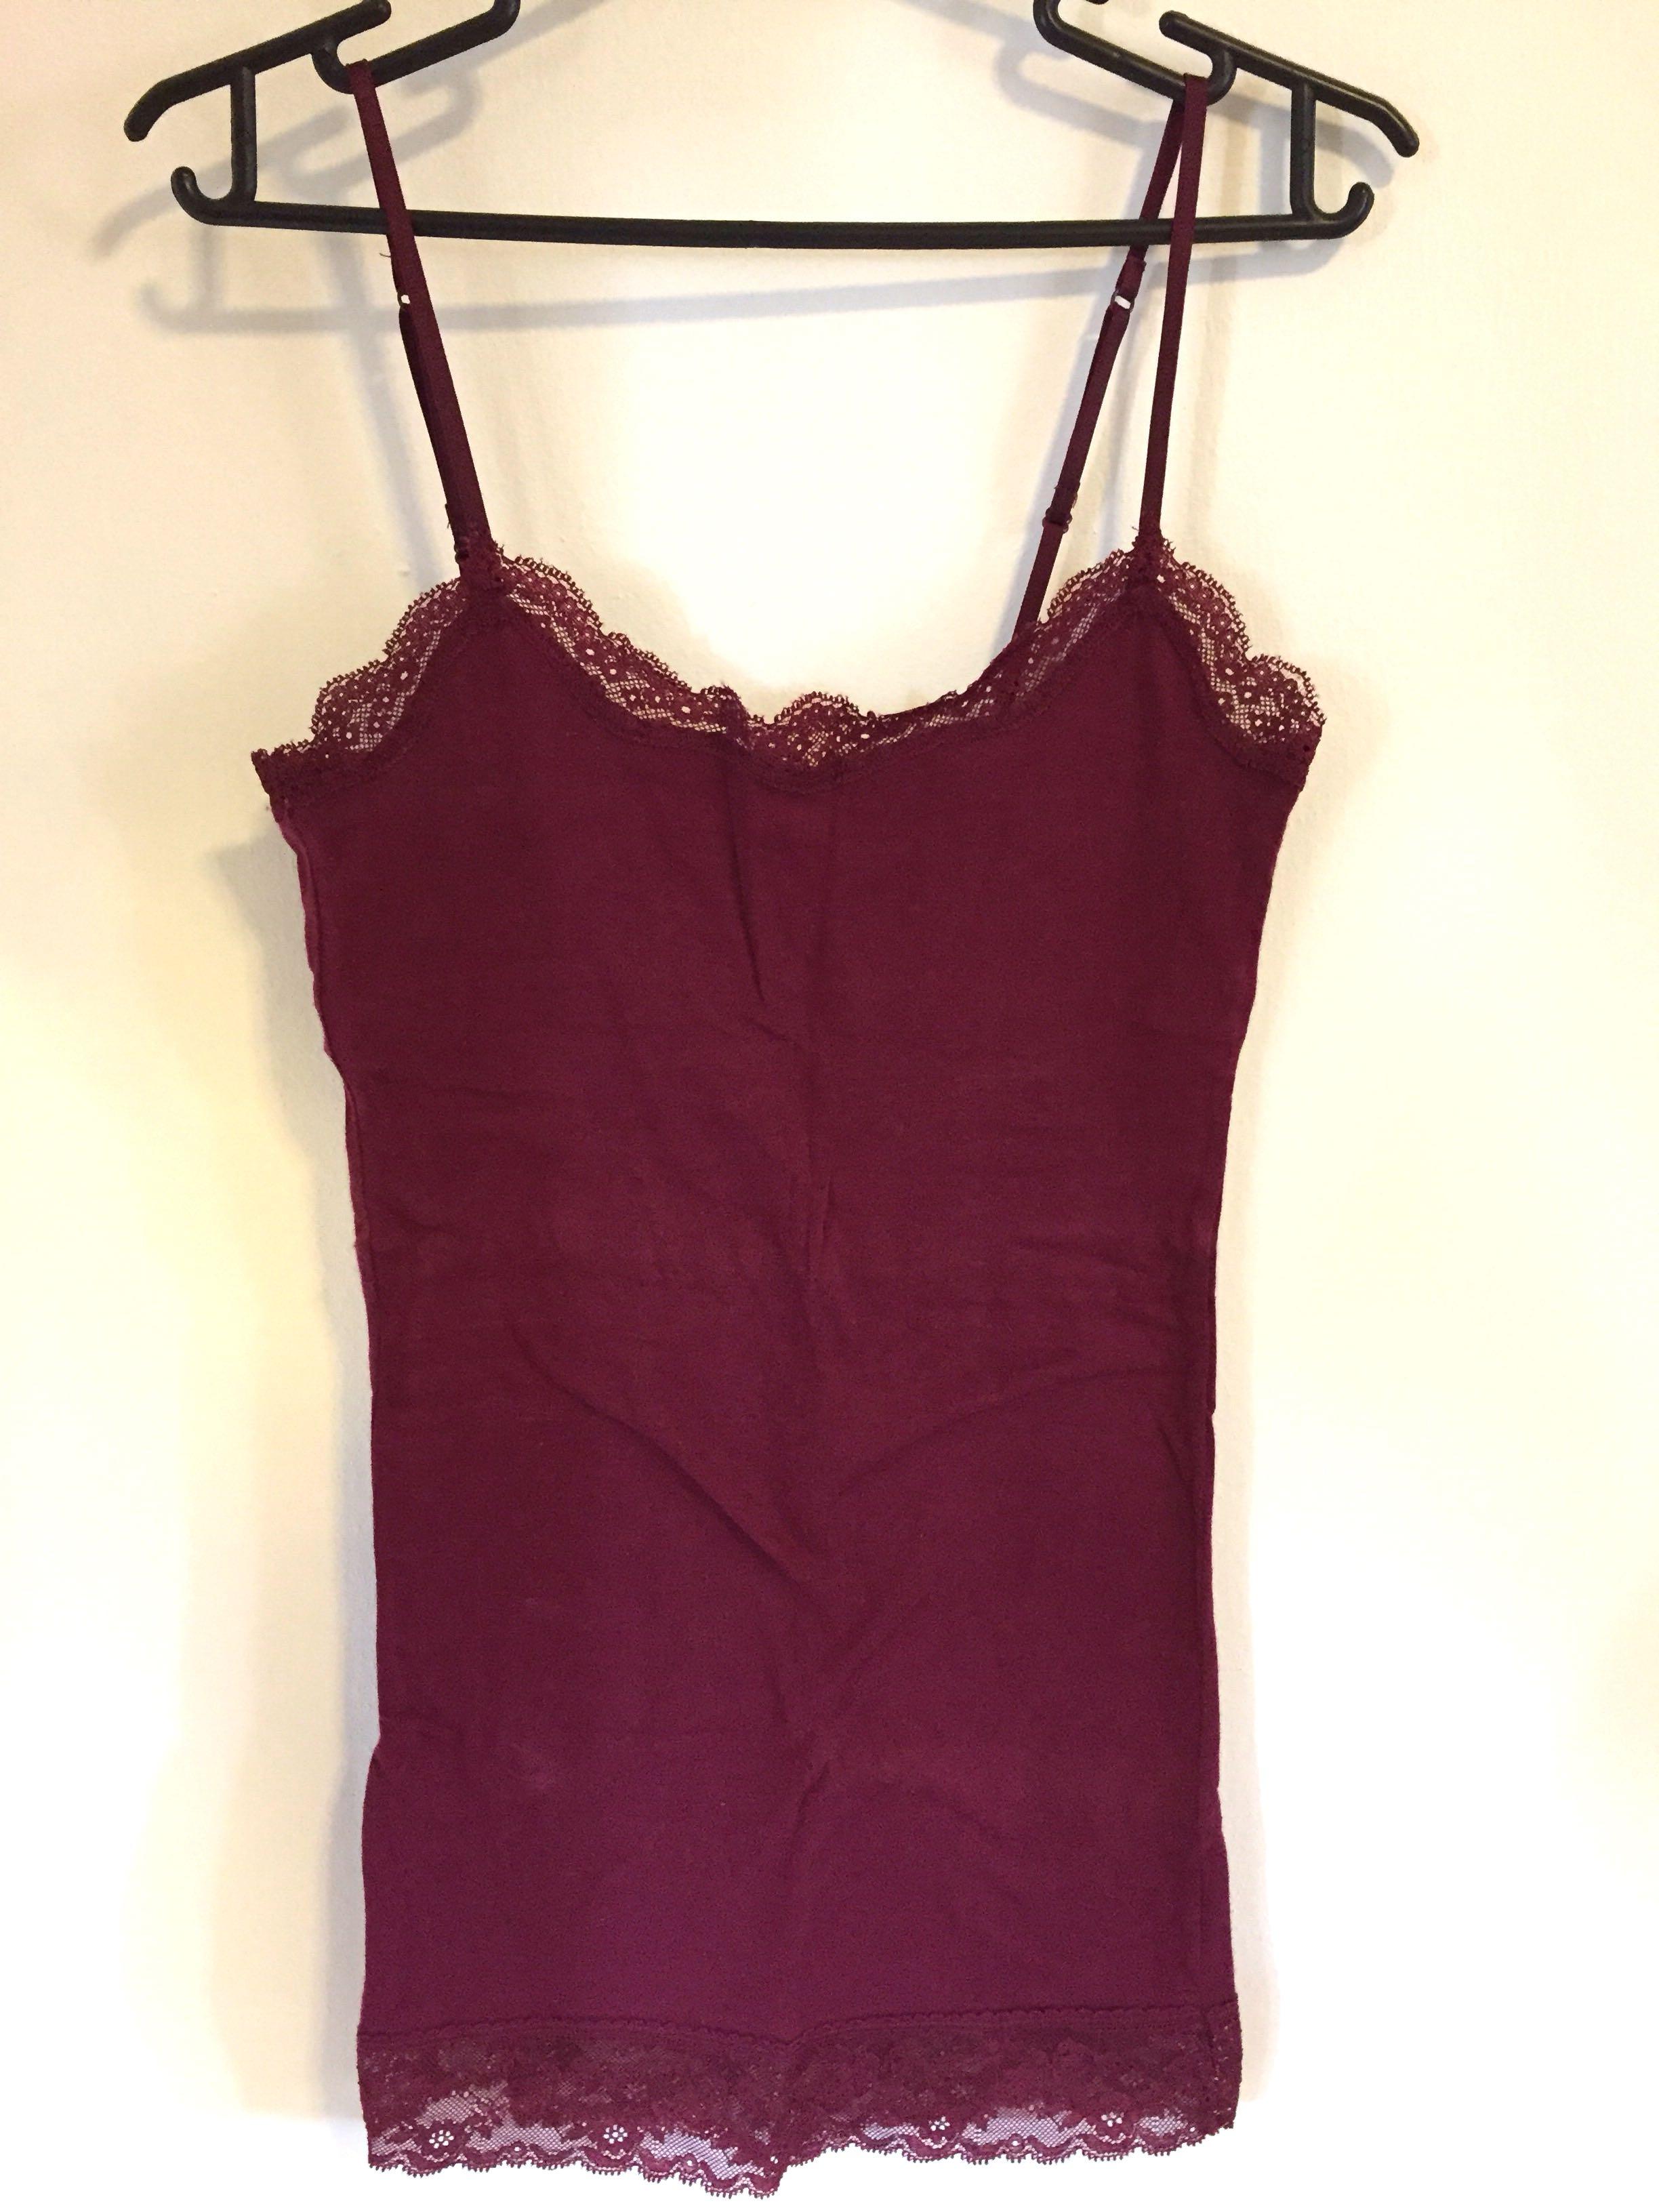 f108703fa9bb3 Aeropostale Basic Lace Cami Tank Top (Wine Red)